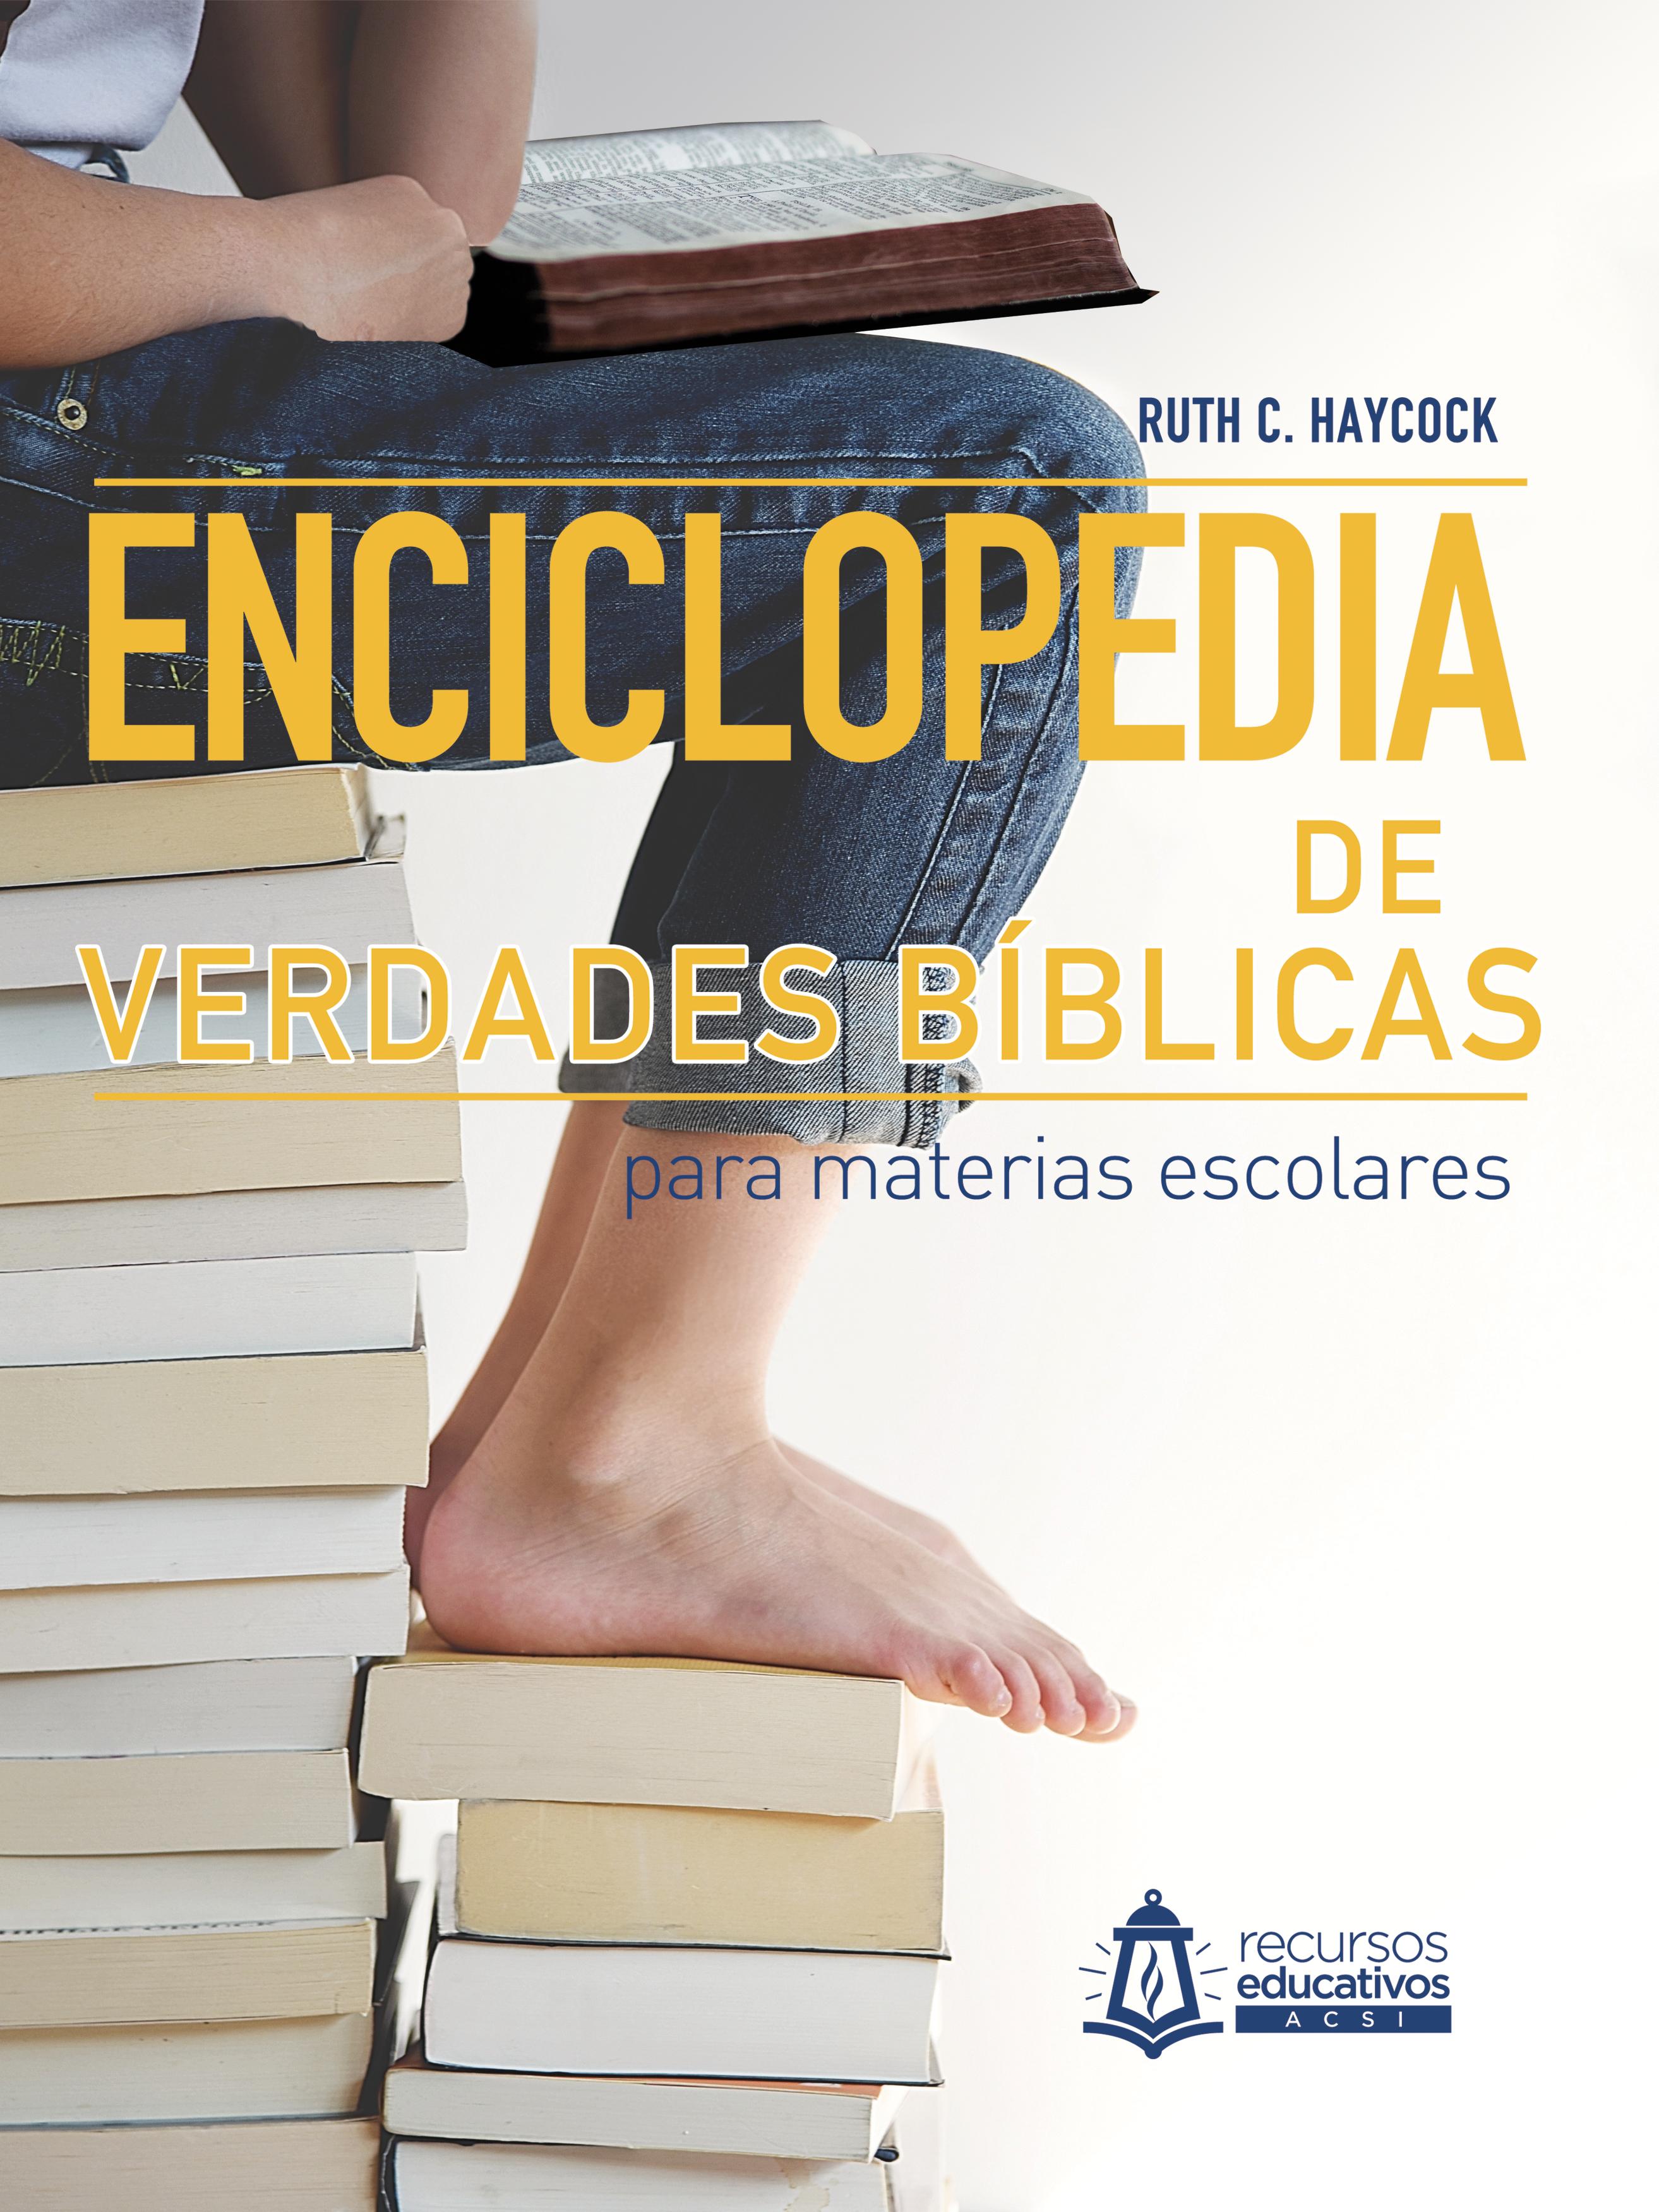 Enciclopedia De Verdades Bíblicas - eBook